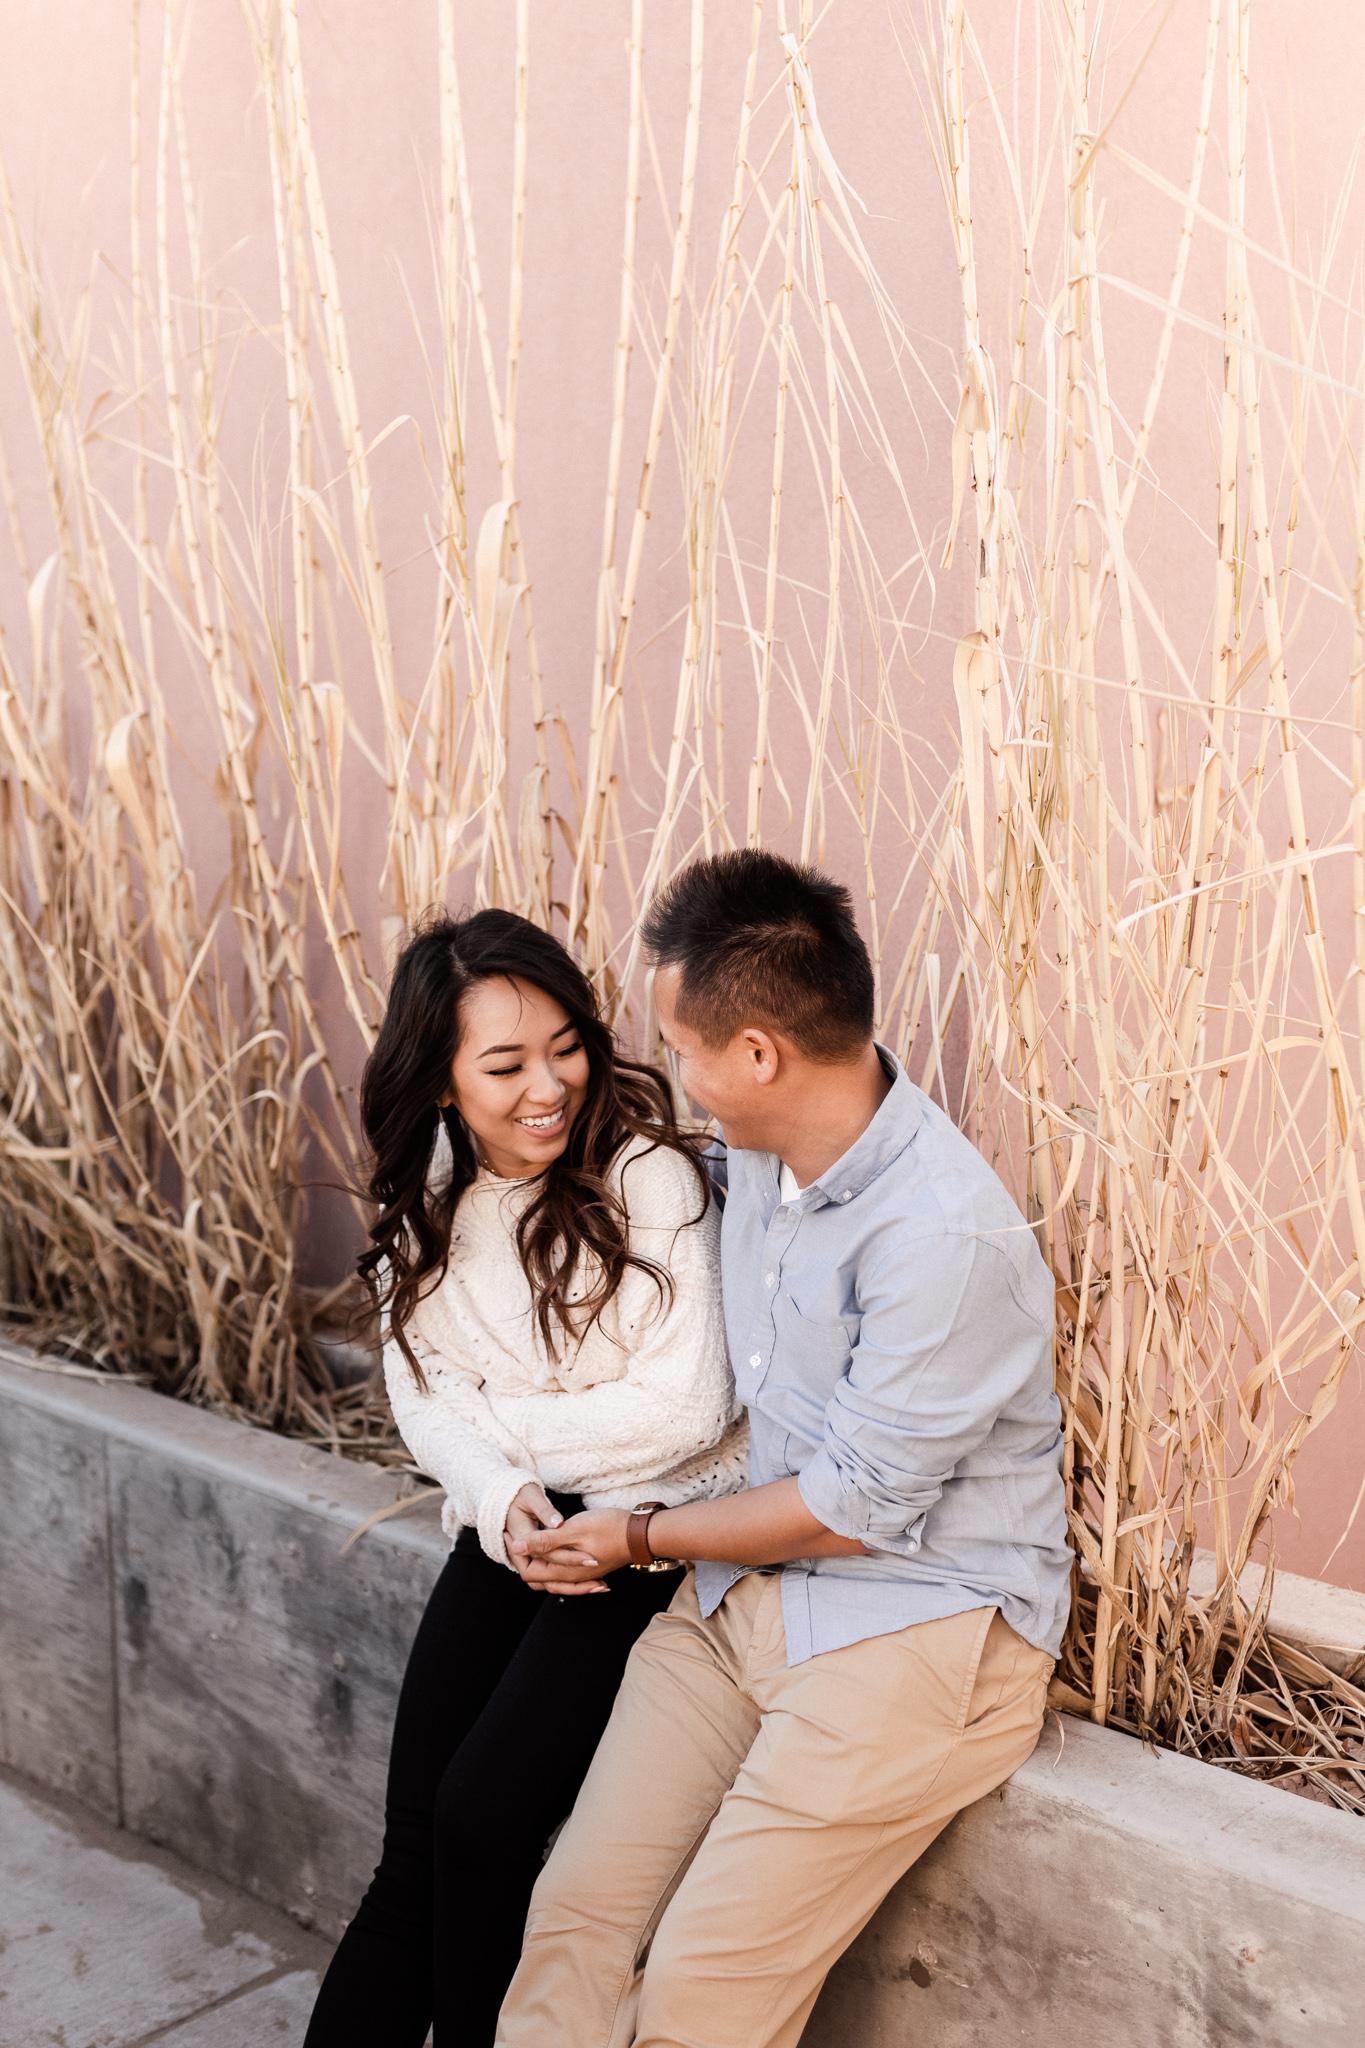 Hieu + Teresa | Colorful Romantic Downtown Engagements | Oklahoma Wedding Photographer-37.jpg